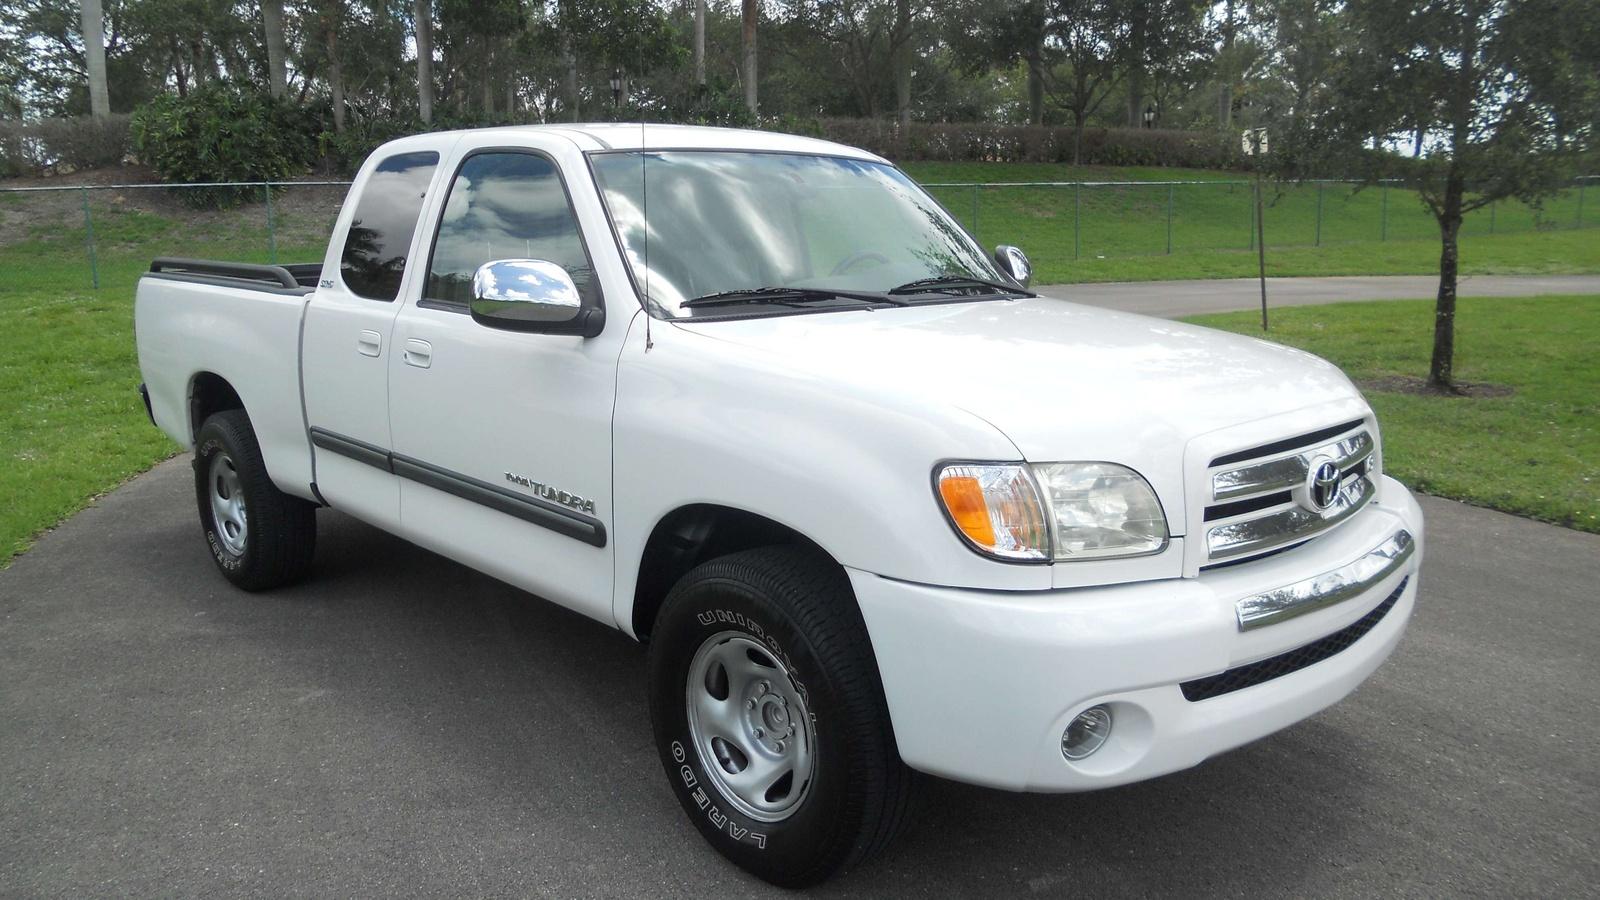 2004 Toyota Tundra Pictures Cargurus